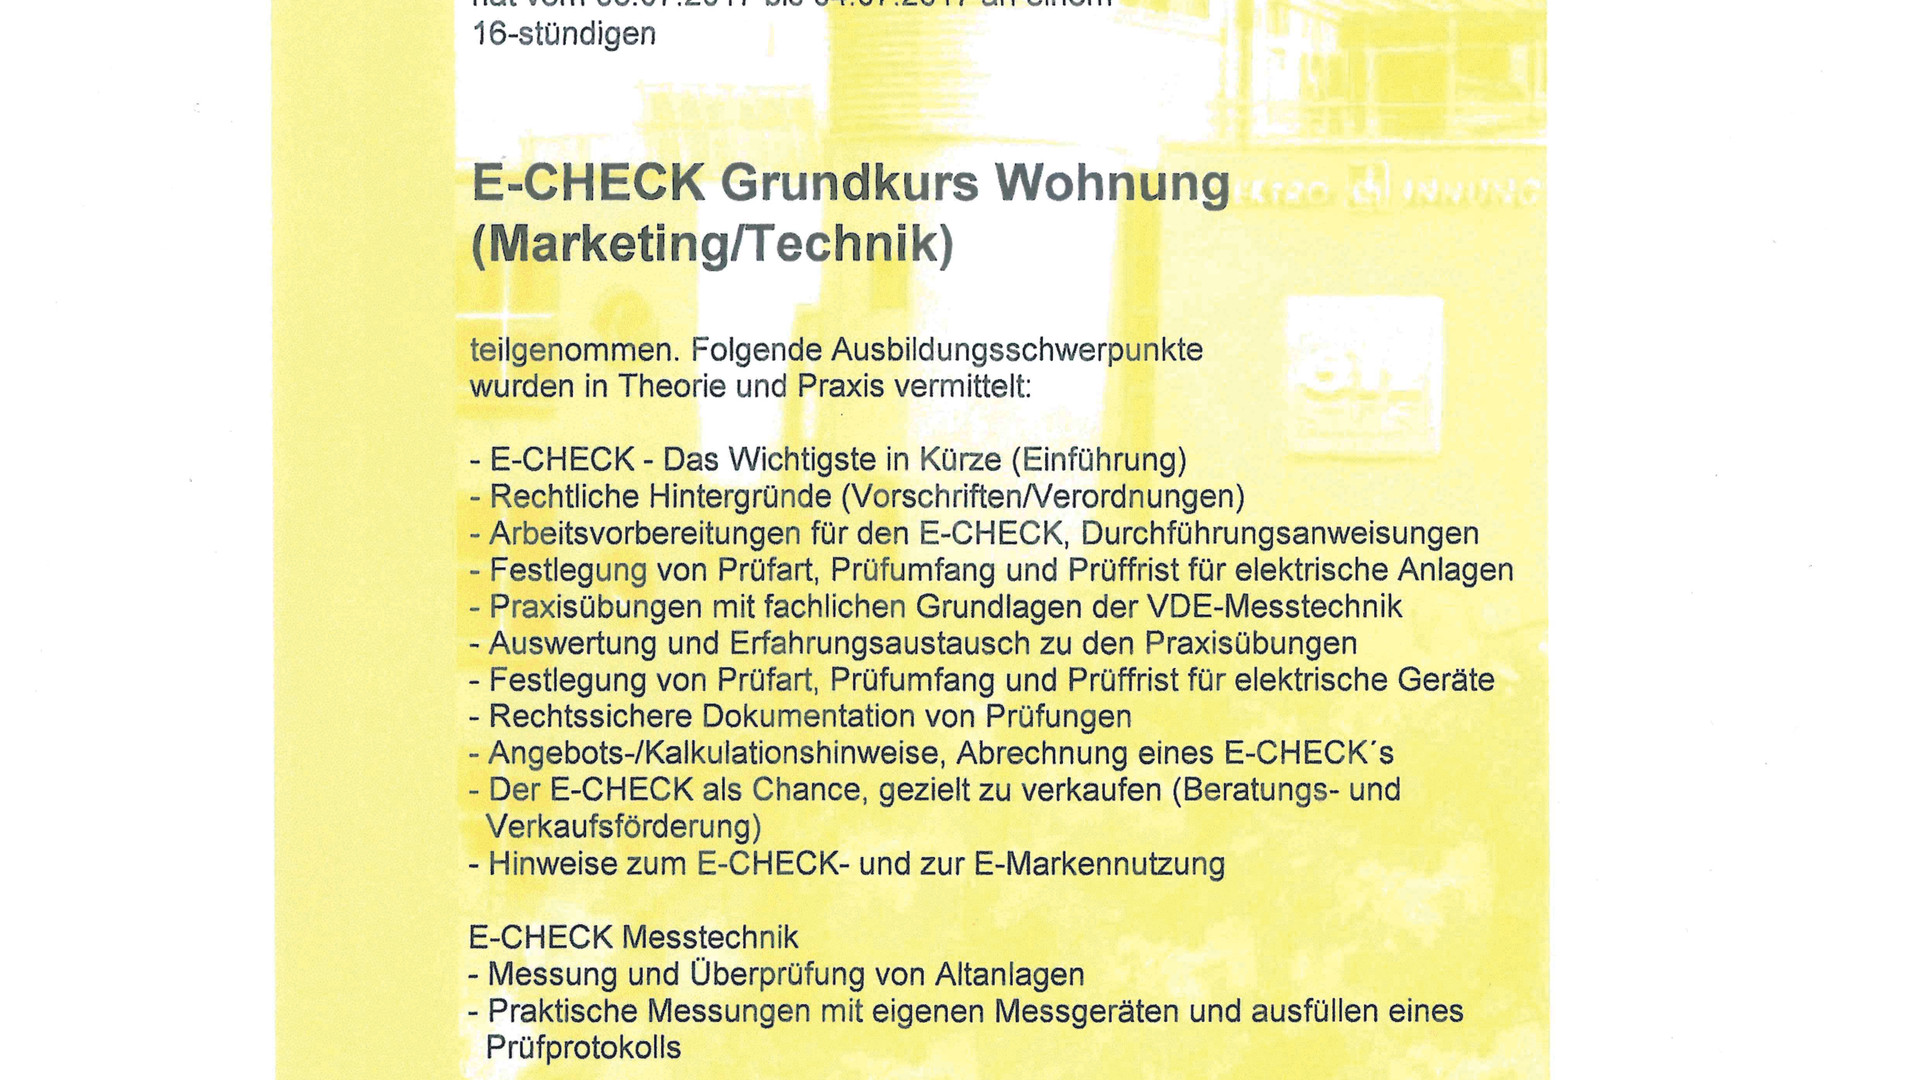 E-Check Grundkurs Wohnung_2.jpg